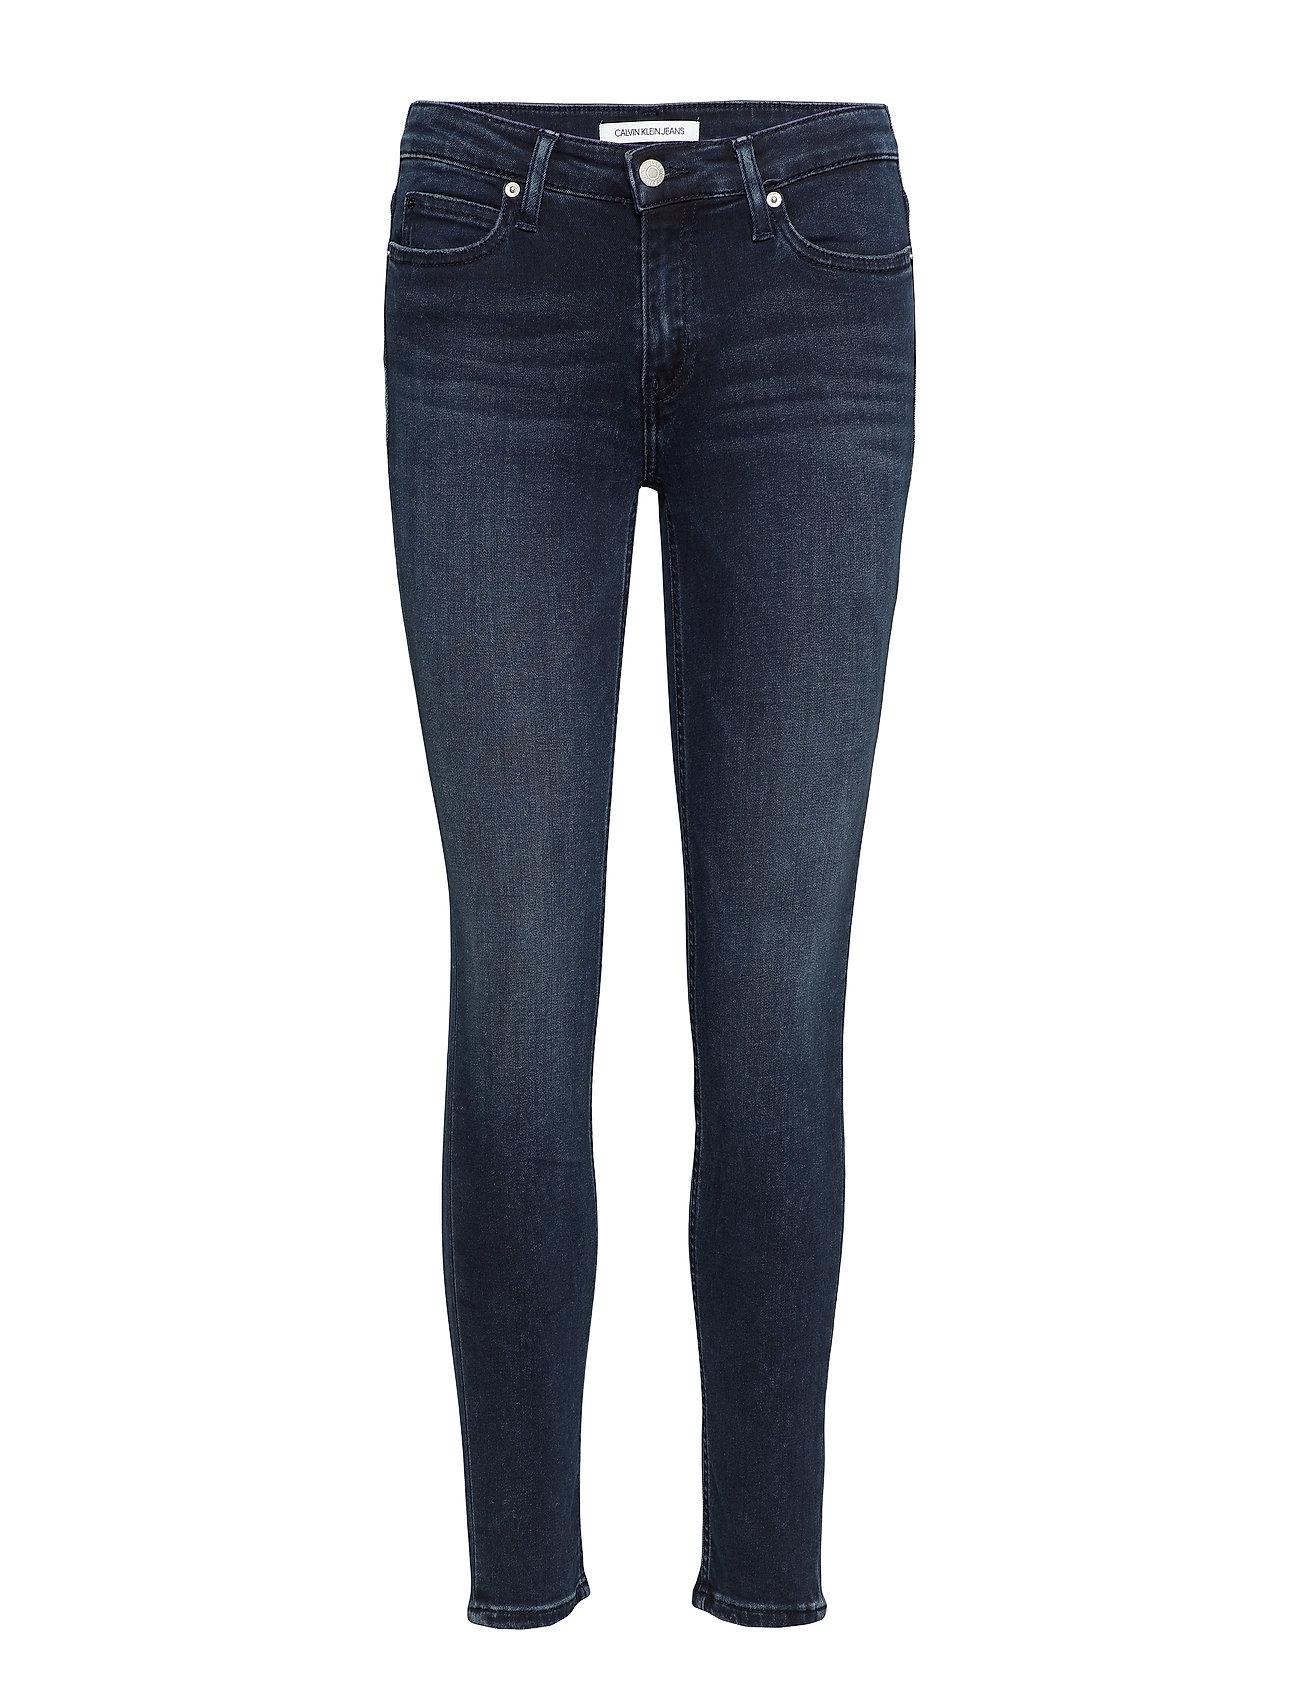 Calvin Klein Jeans CKJ 011 MID RISE SKI